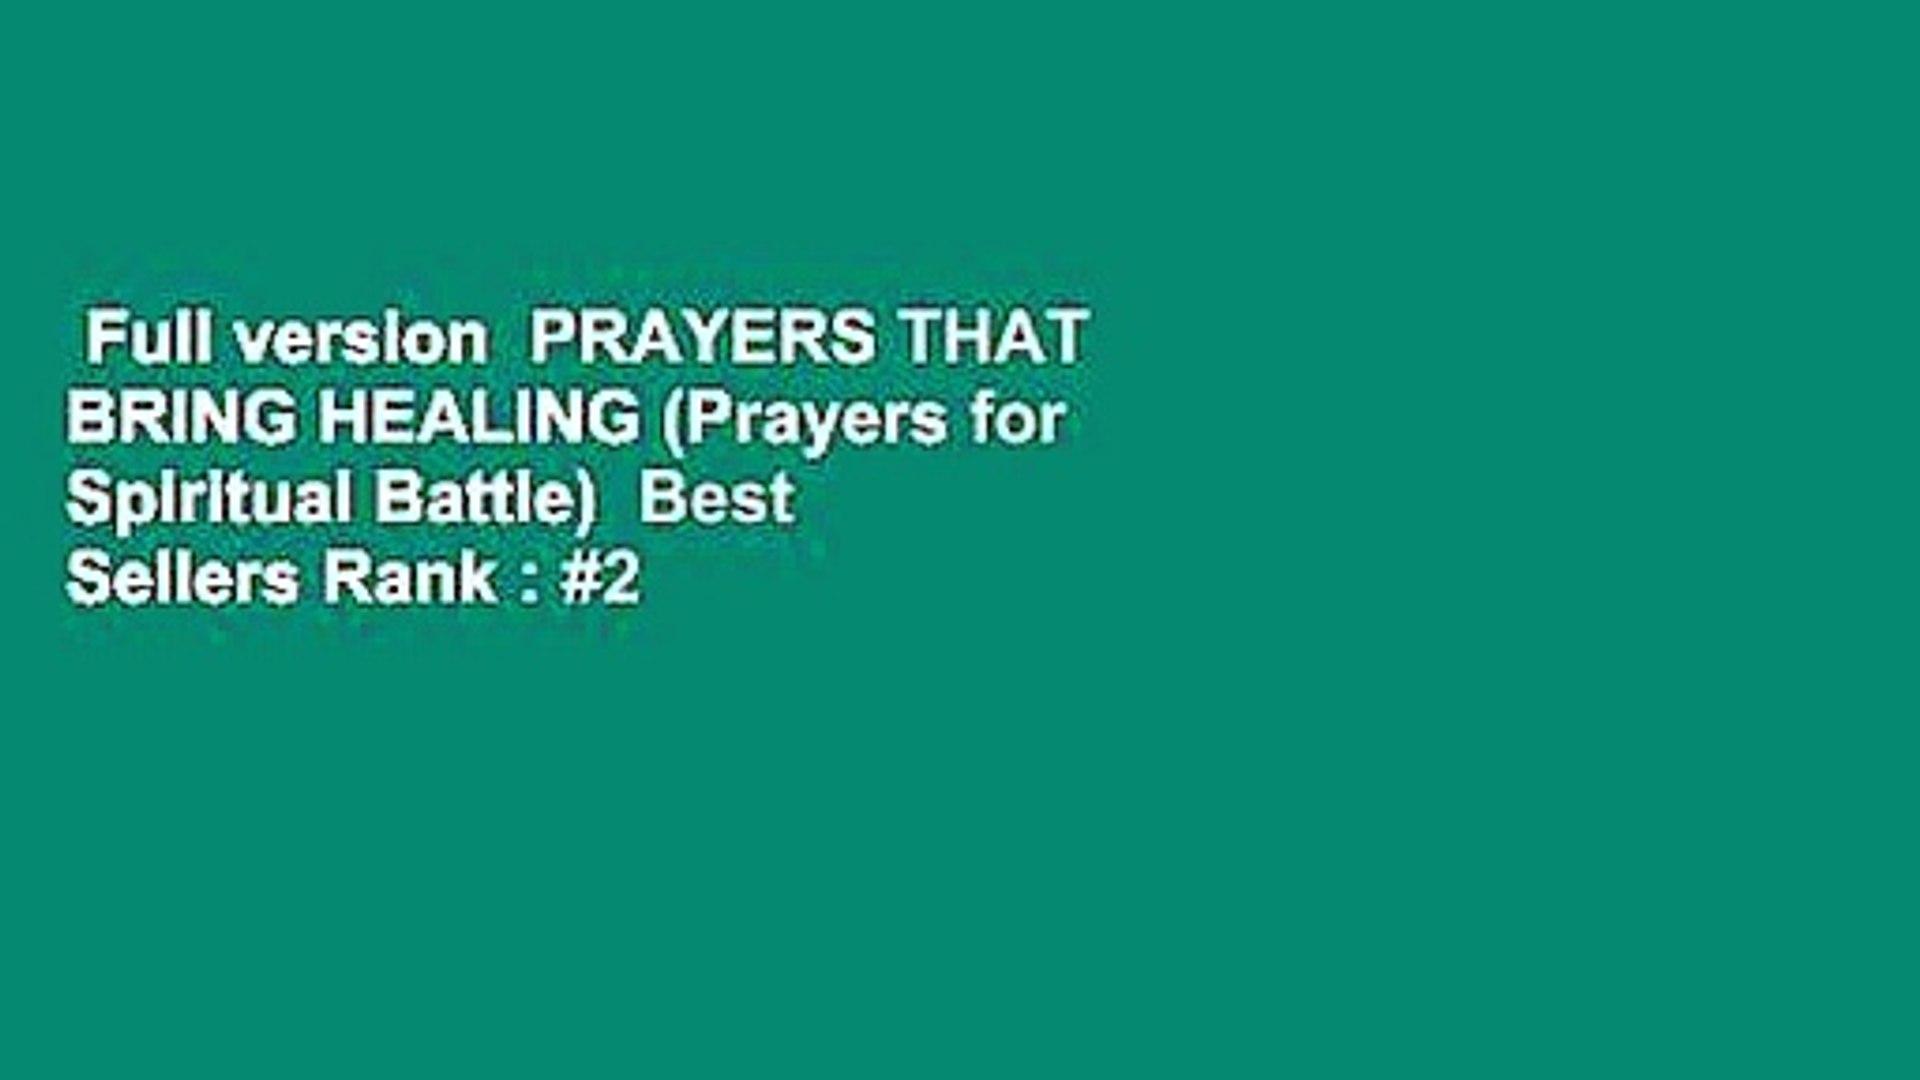 Full version  PRAYERS THAT BRING HEALING (Prayers for Spiritual Battle)  Best Sellers Rank : #2